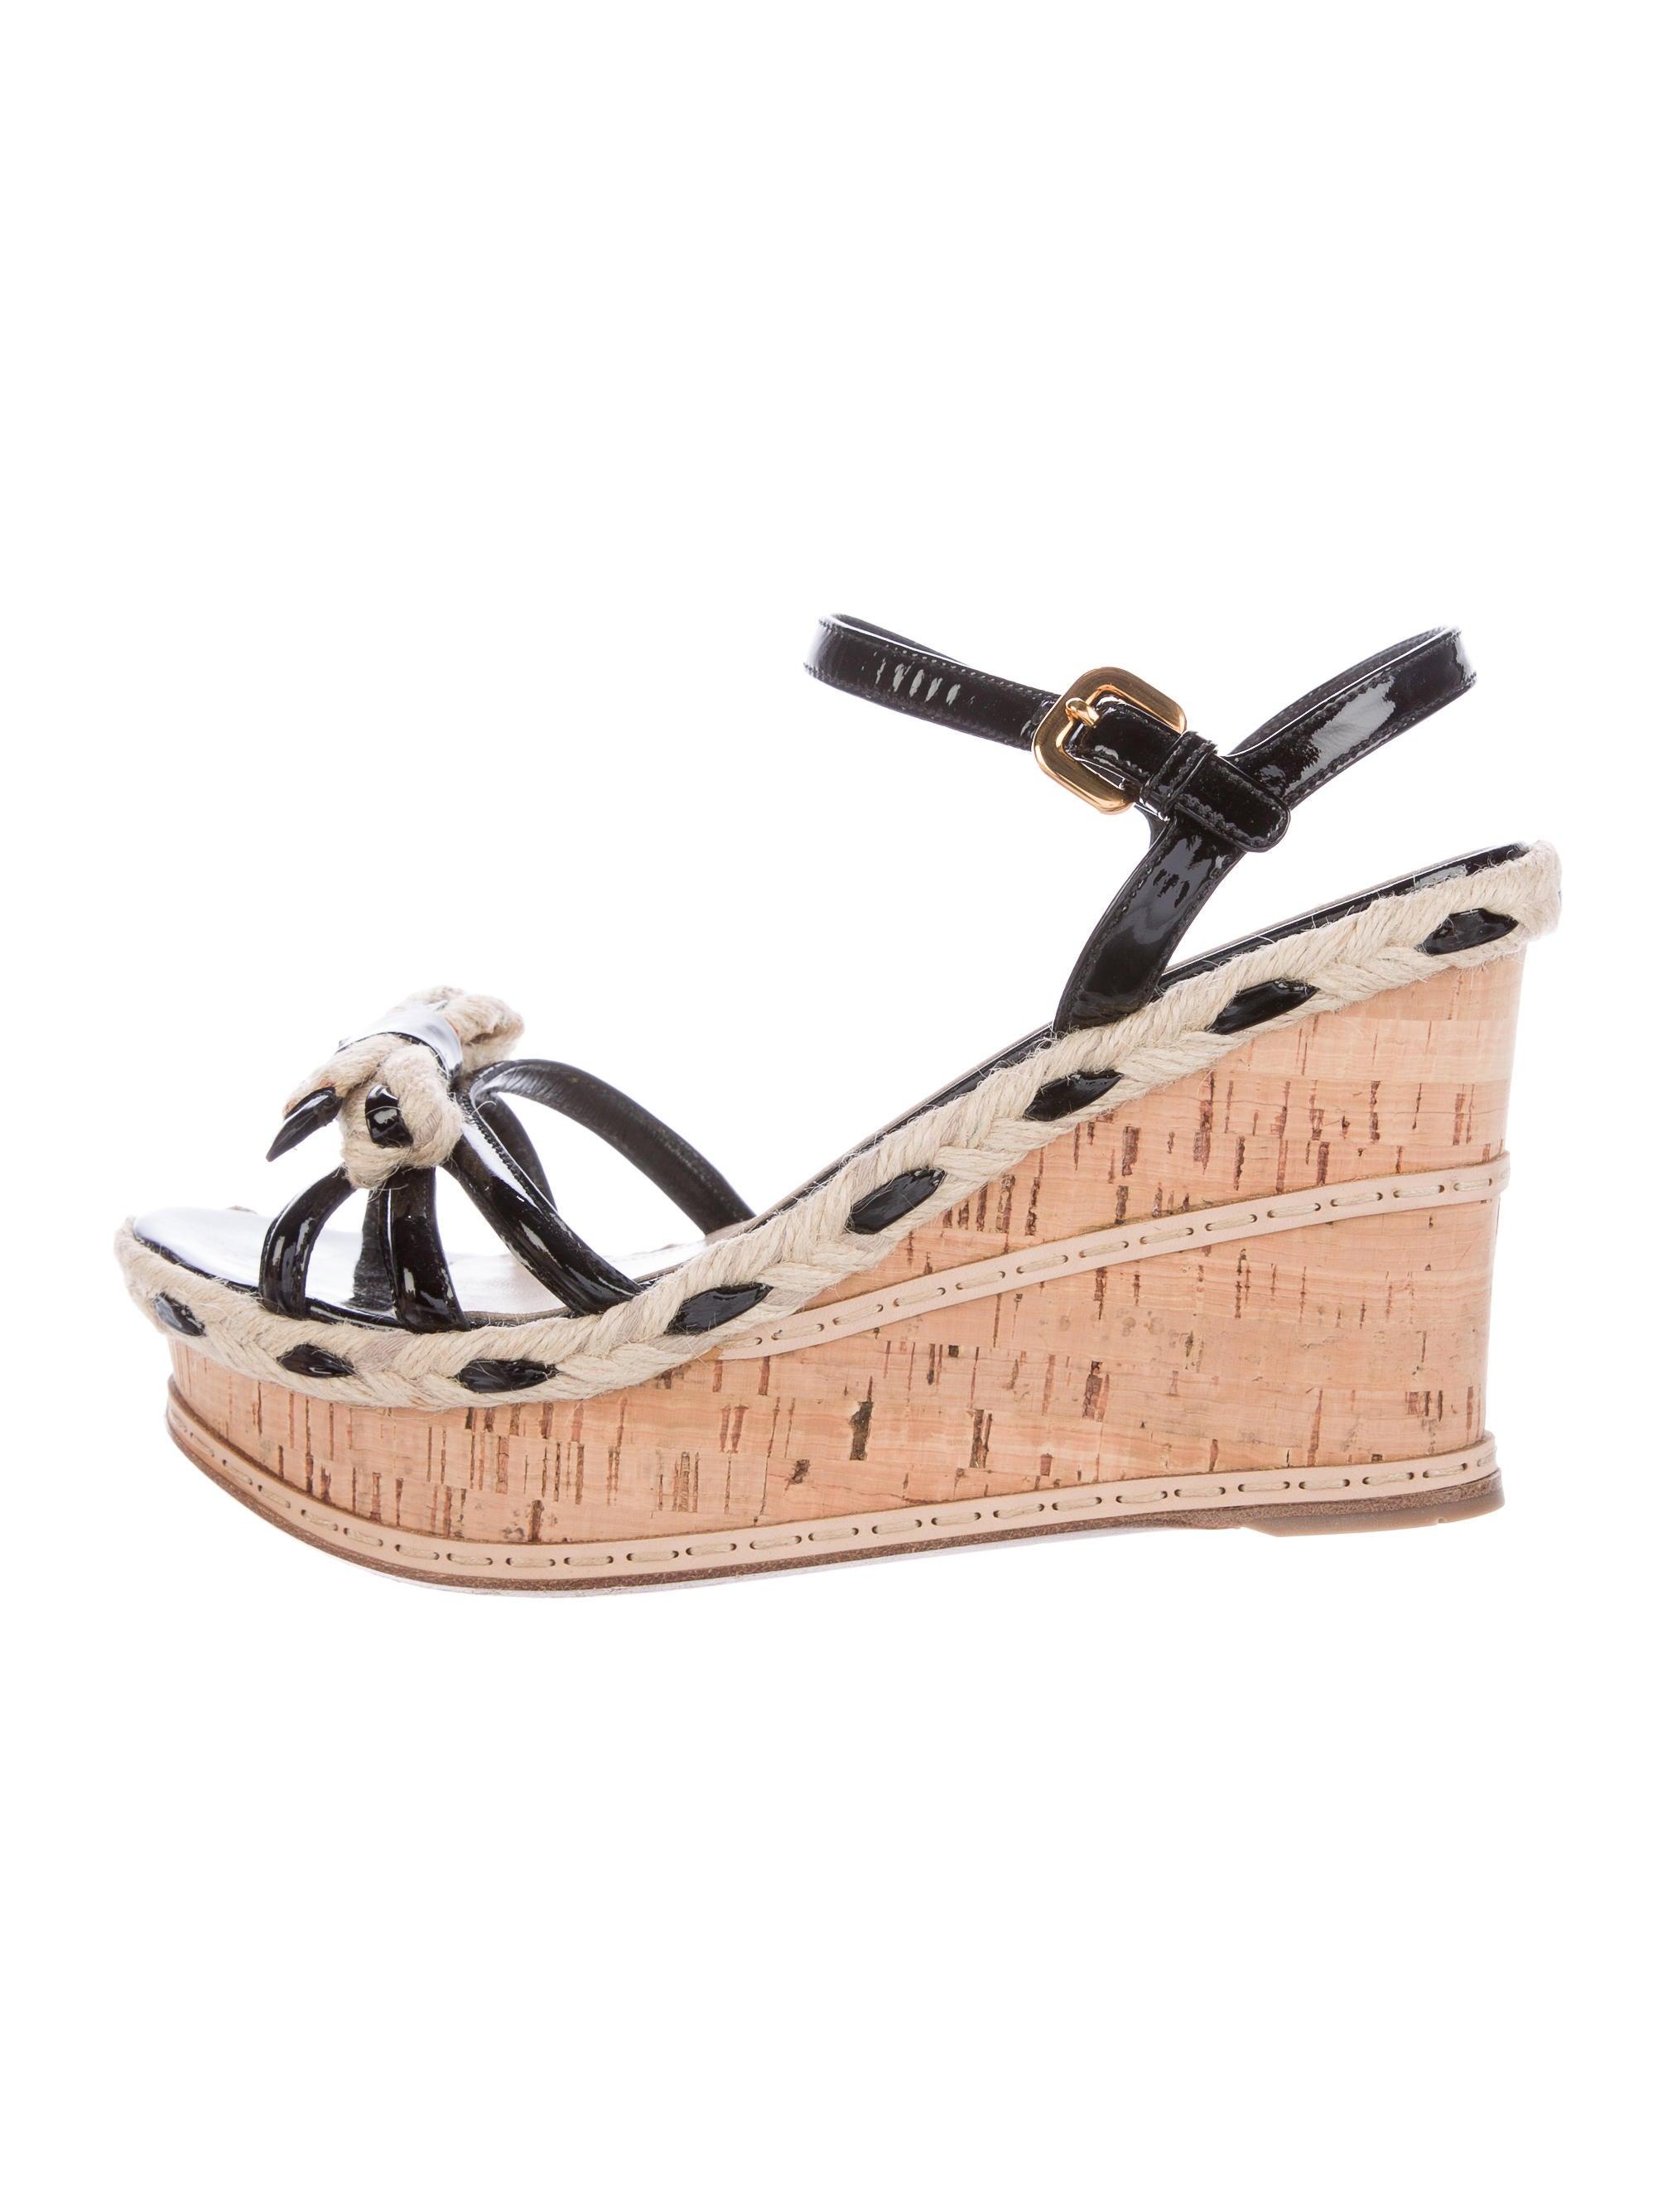 prada espadrille wedge sandals shoes pra137308 the